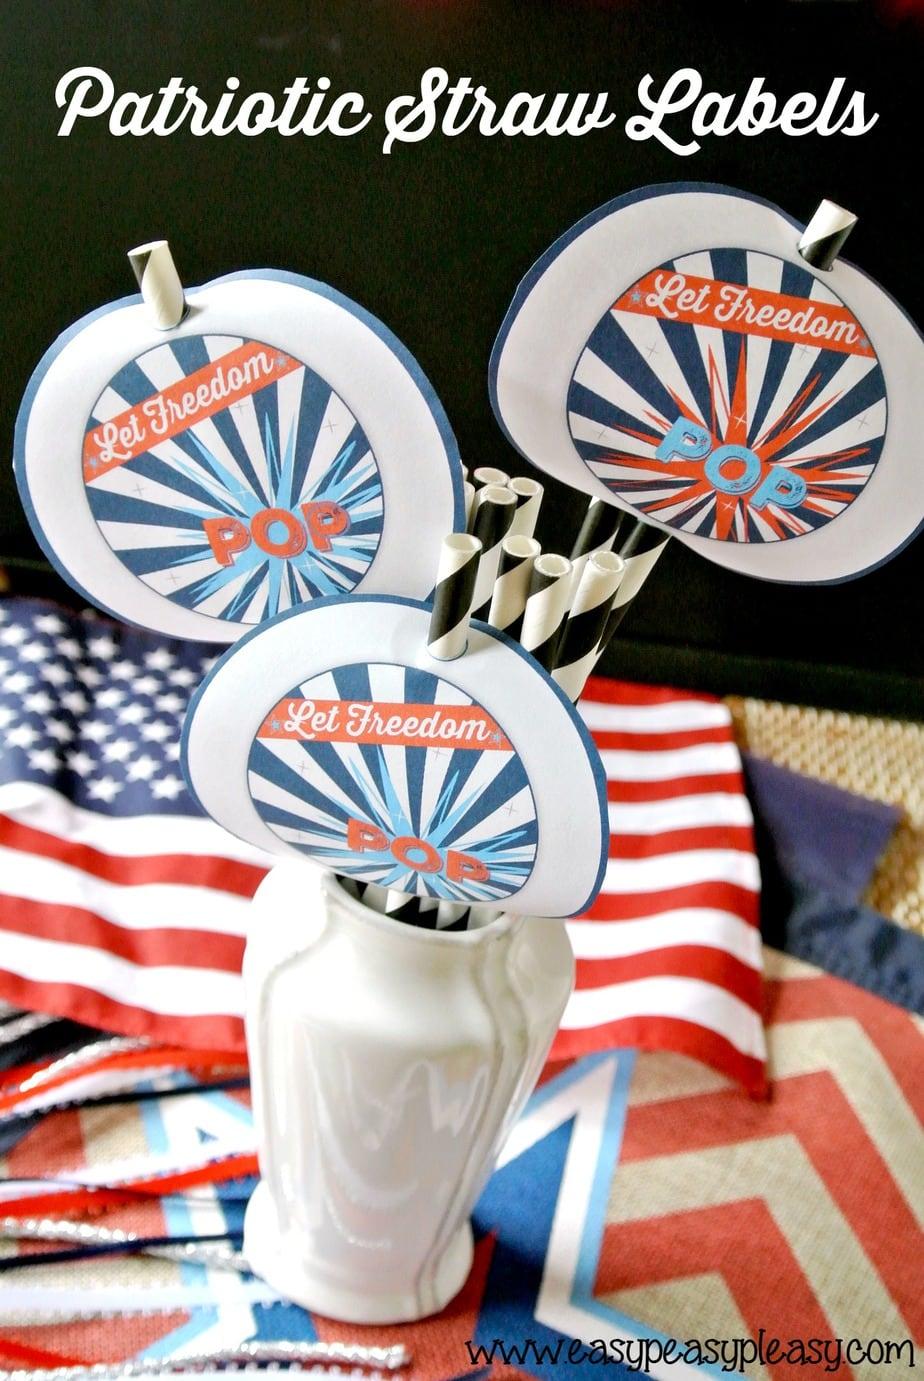 Free Printable Patriotic Party Pack Straw Labels.